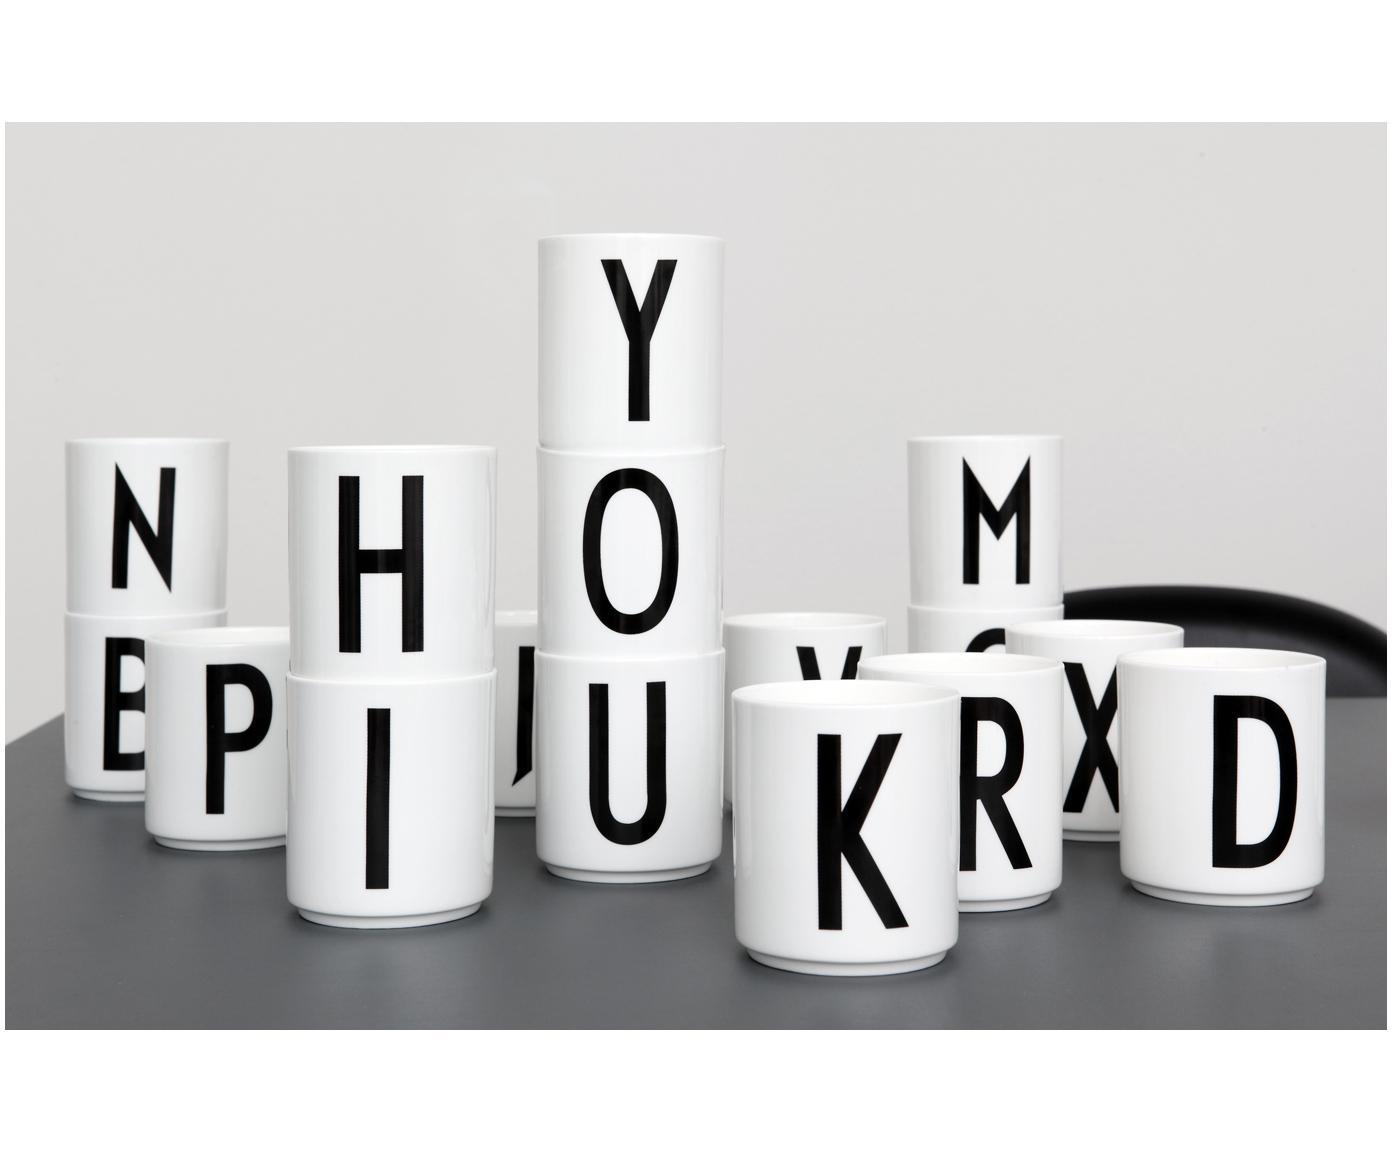 Beker Personal (varianten van A tot Z), Fine Bone China, Wit, zwart, Ø 8 x H 9 cm